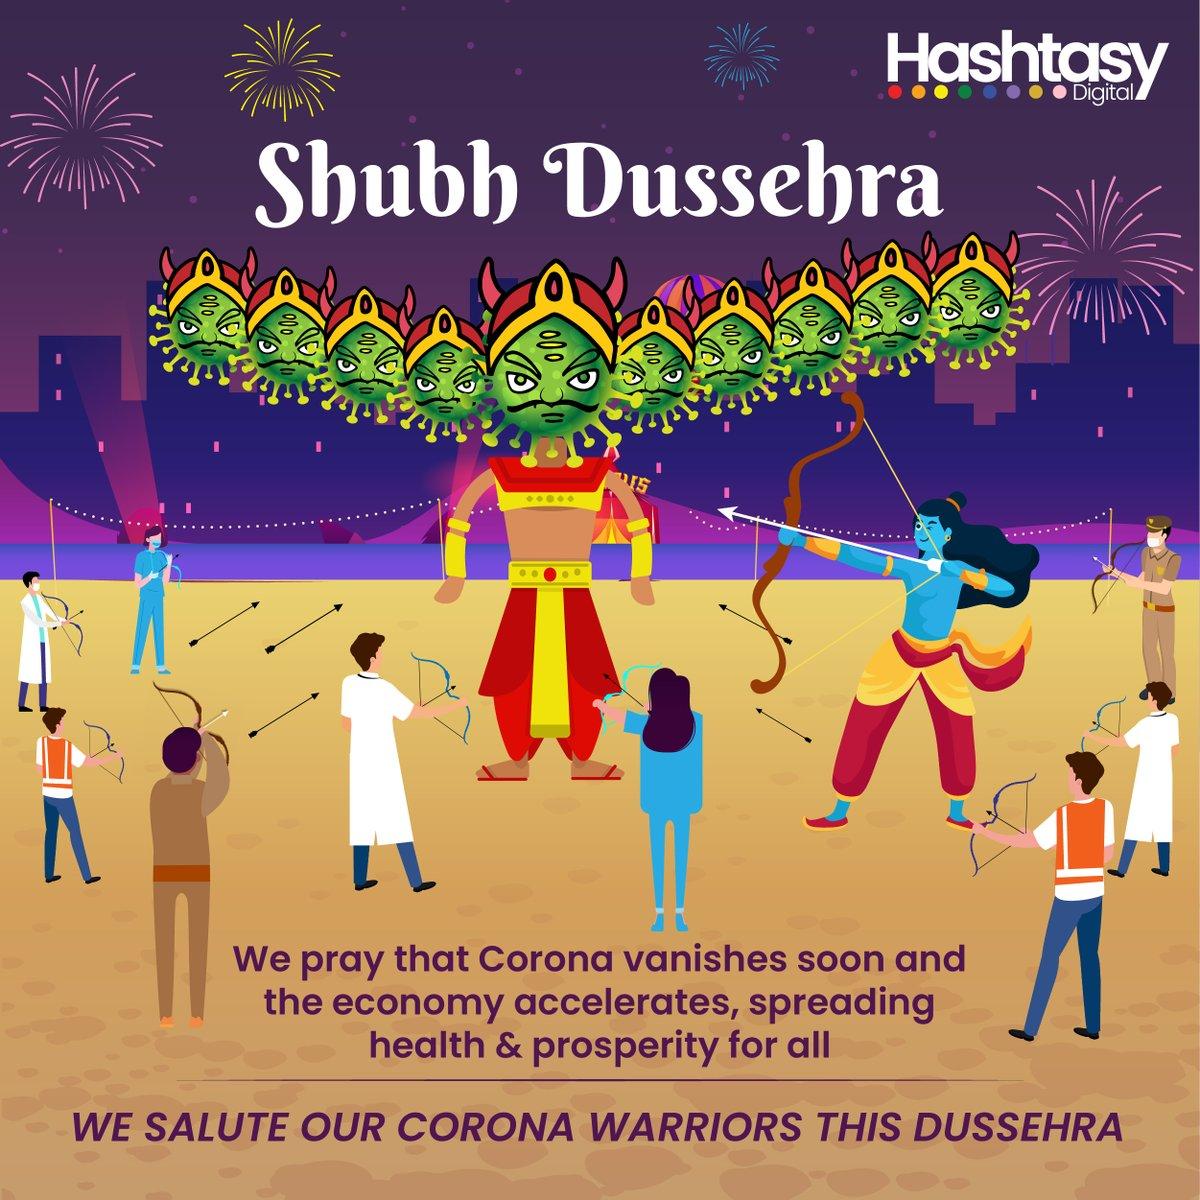 Wishing all our clients, friends, family and team Shubh Dussehra! #Hashtasydigital  #digitalagency #dussehra #dussehra2020 #ShubhDussehra #wishes #coronawarriors #salutewarriors #Coronavirus #letthevirusvanish #healthandprosperity #economy #economyaccelerates ##agencylife https://t.co/hMBlYt9e1u